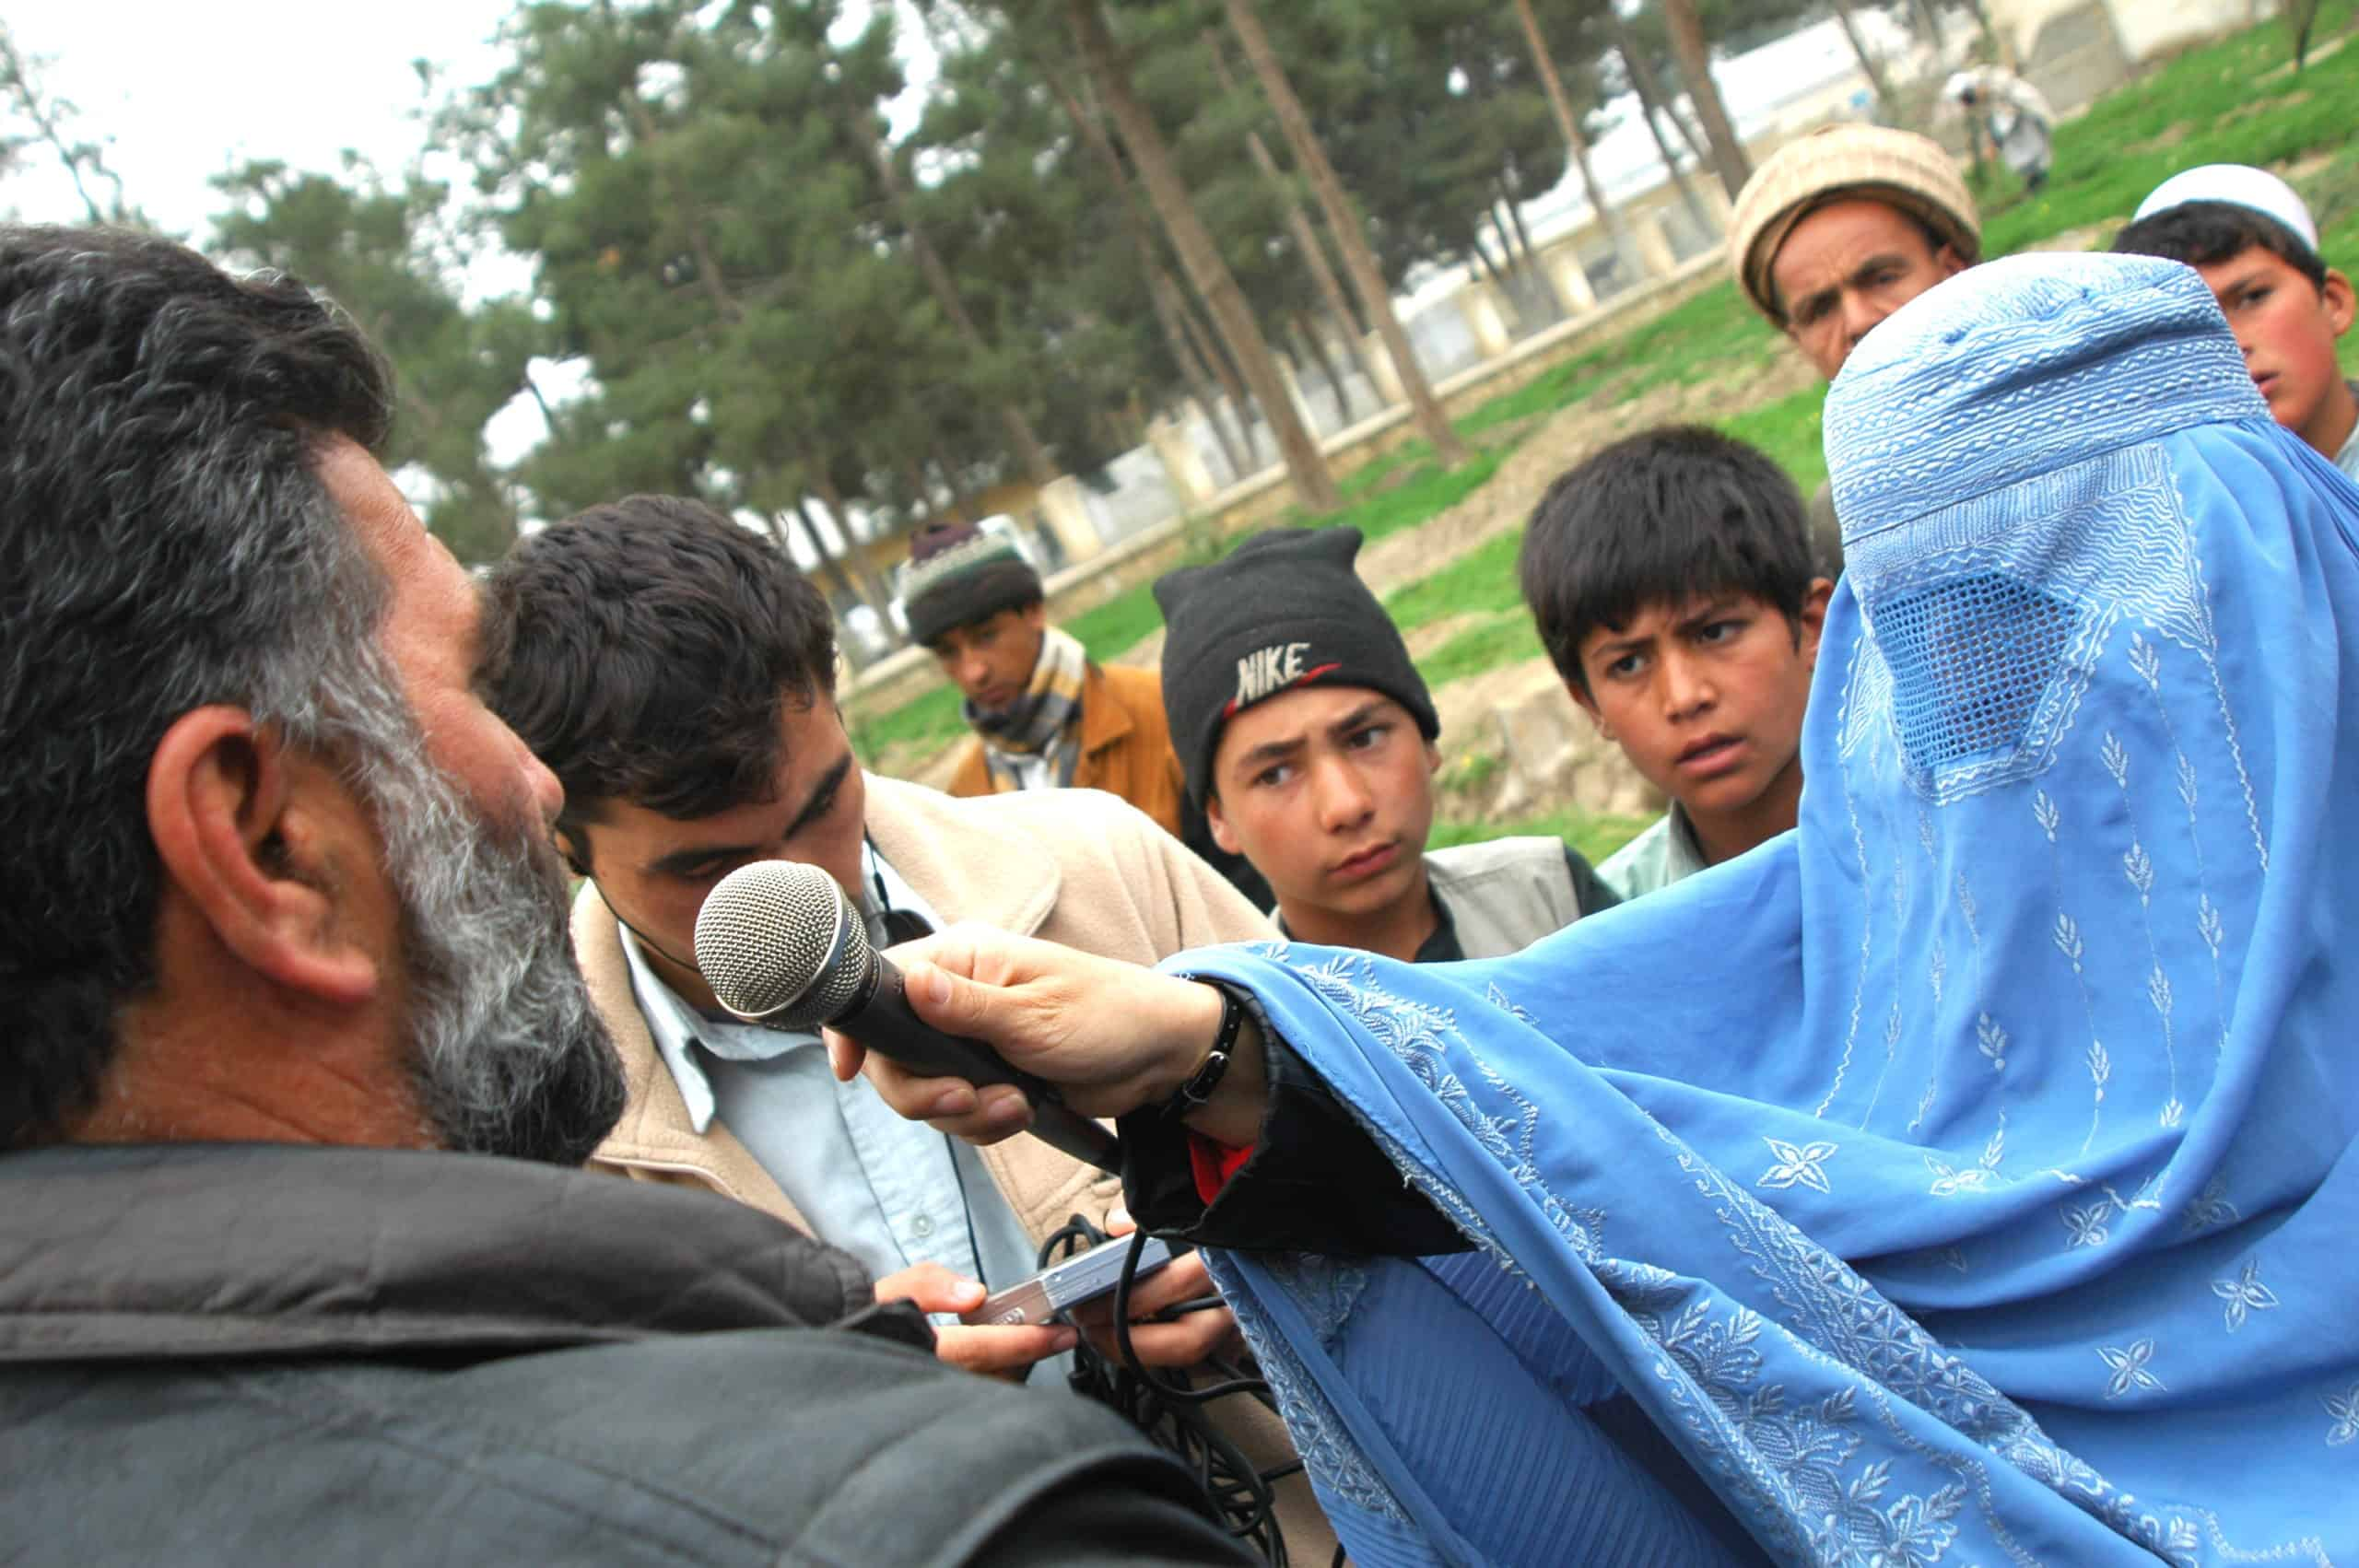 An Afghan woman in a burqa interviews some men